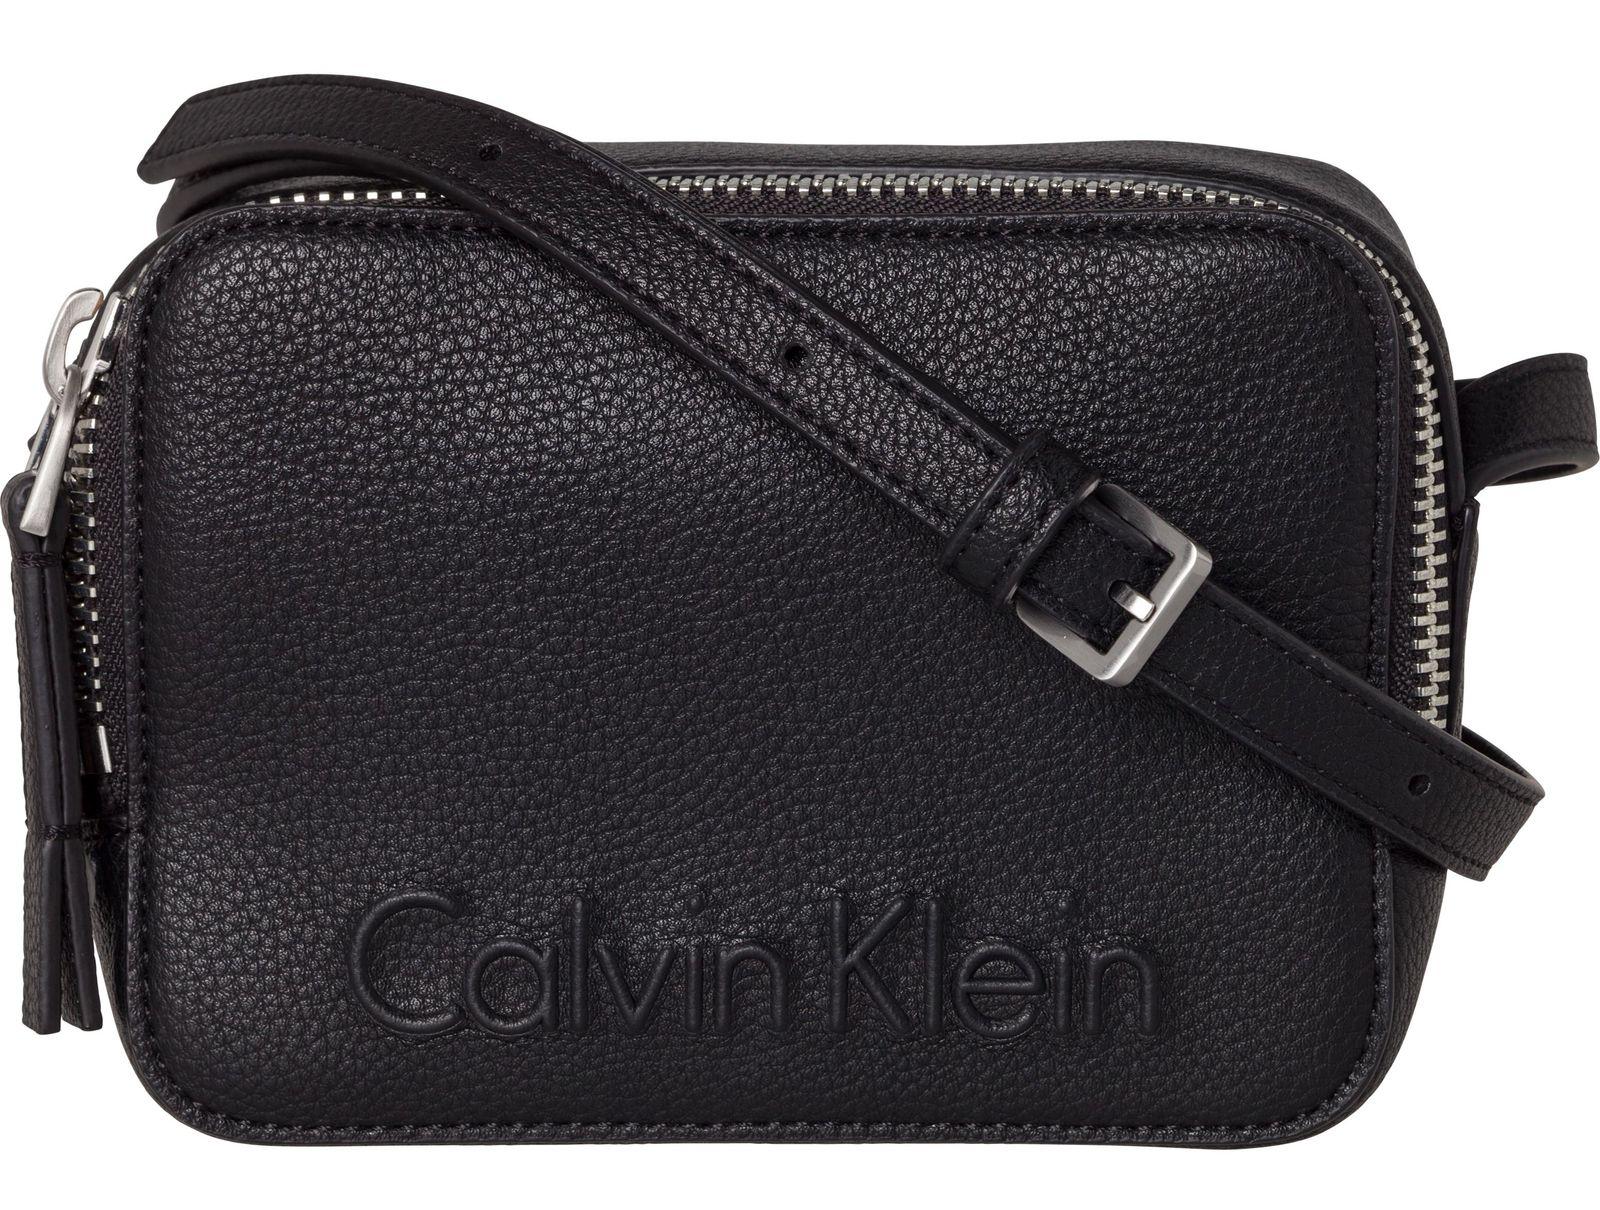 b21687e28f Calvin-Klein-Edge-Small-Crossbody-Black-145637.jpg